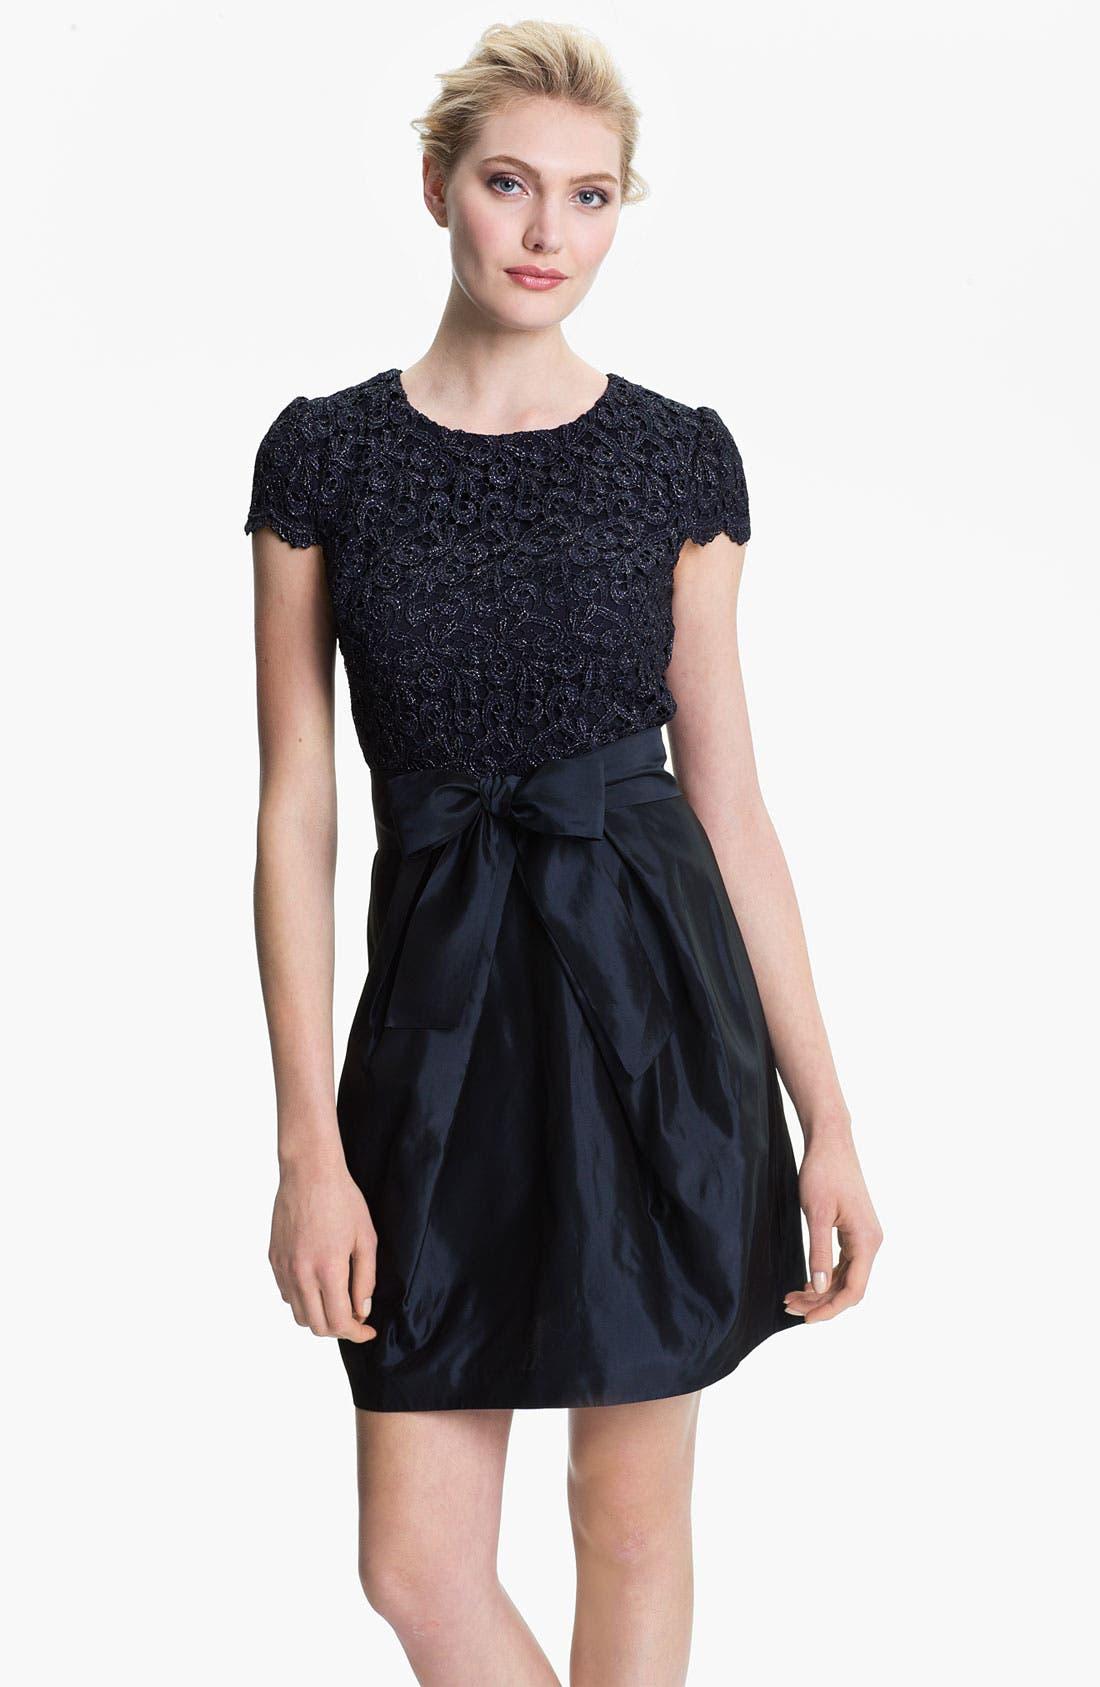 Main Image - Suzi Chin for Maggy Boutique Lace & Taffeta Dress (Petite)